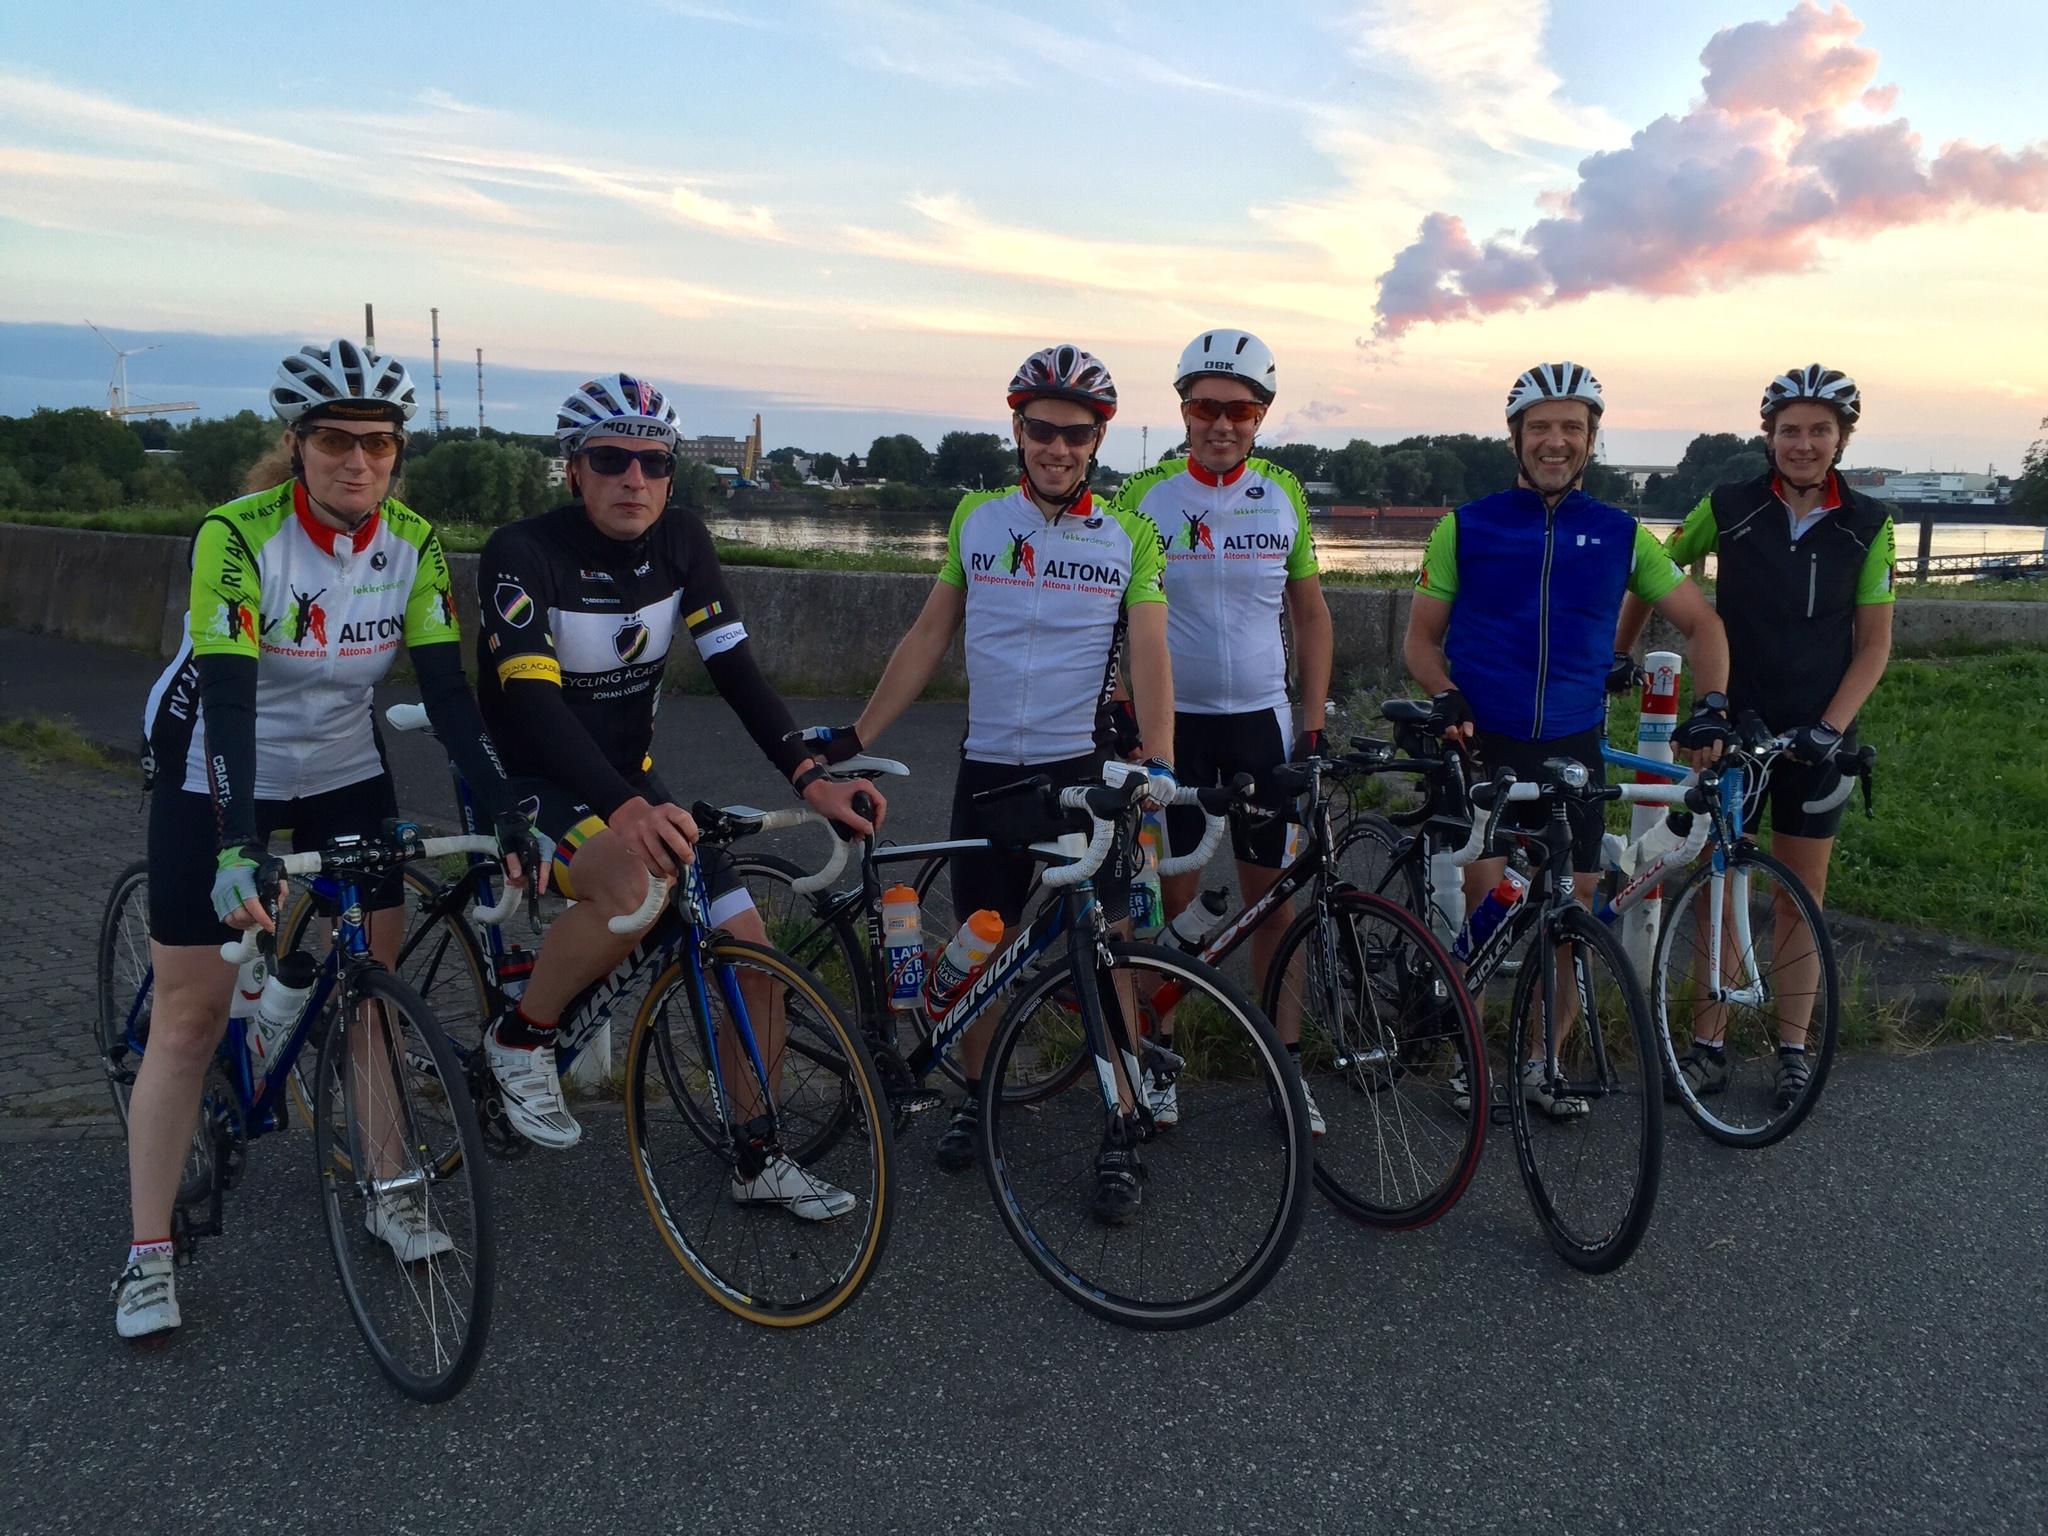 RV Altona Gruppenfoto der Trainingsrunde am Deich am 2.8.2016